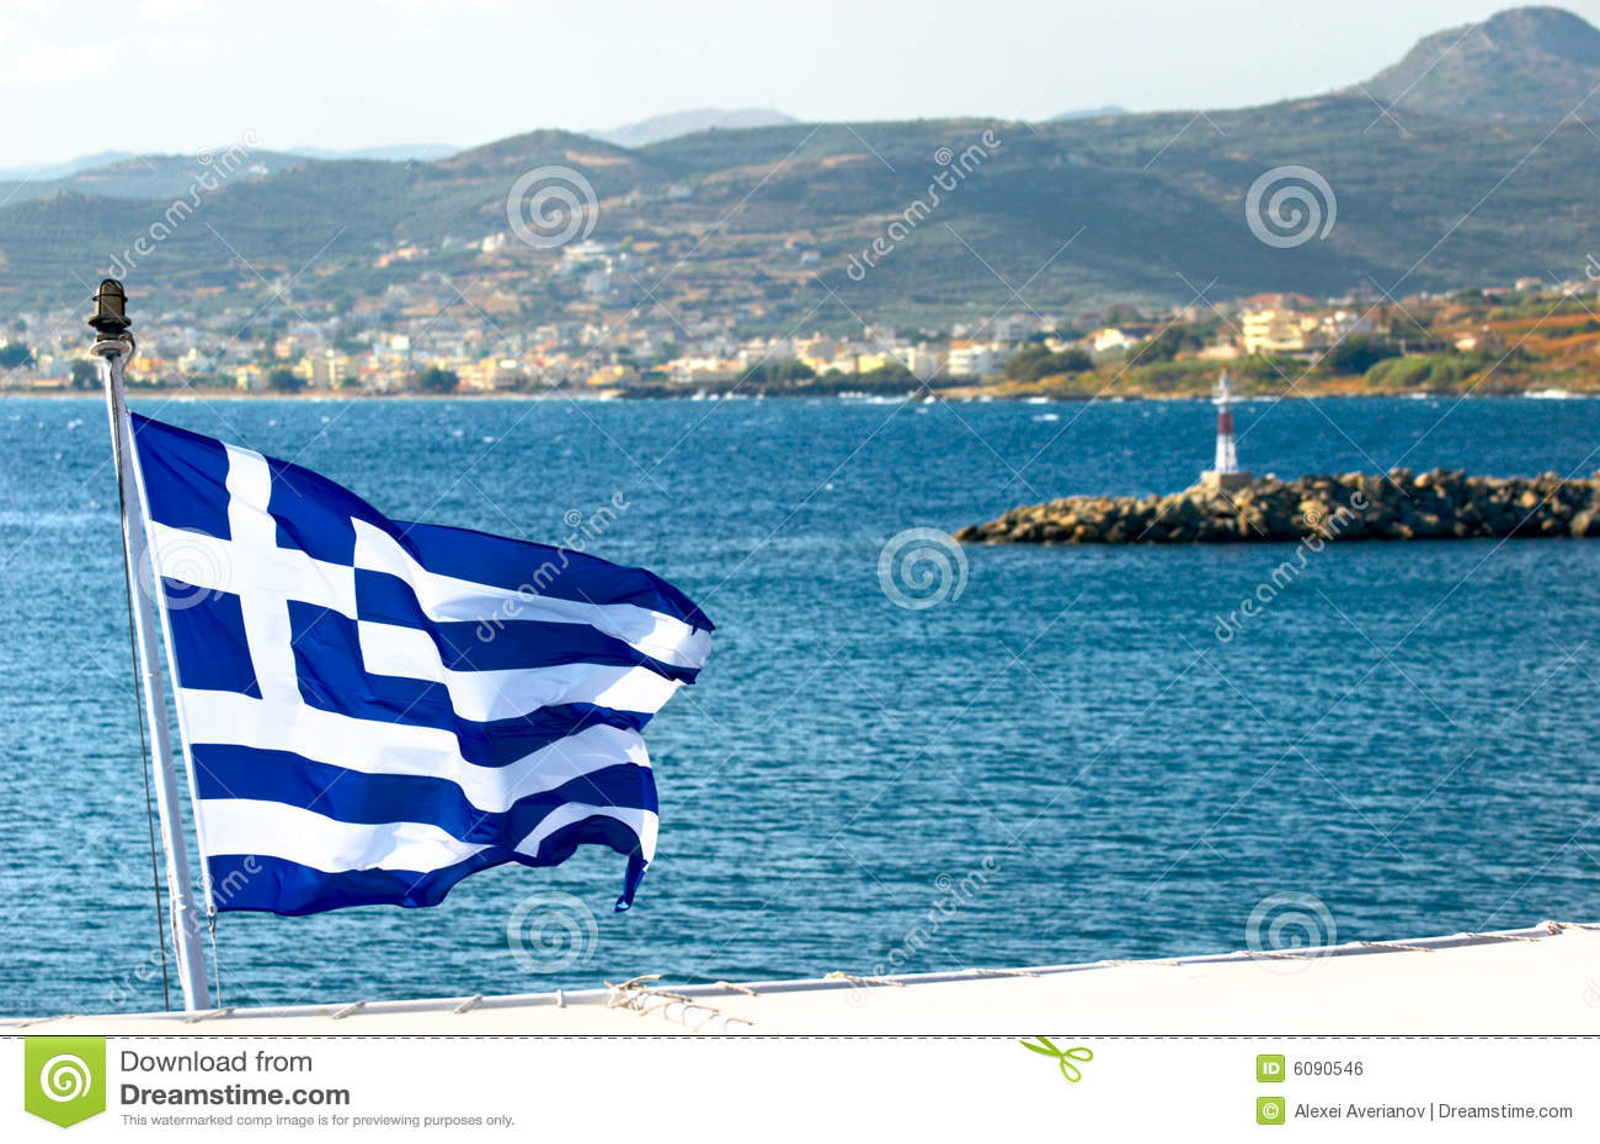 Online dating crete greece